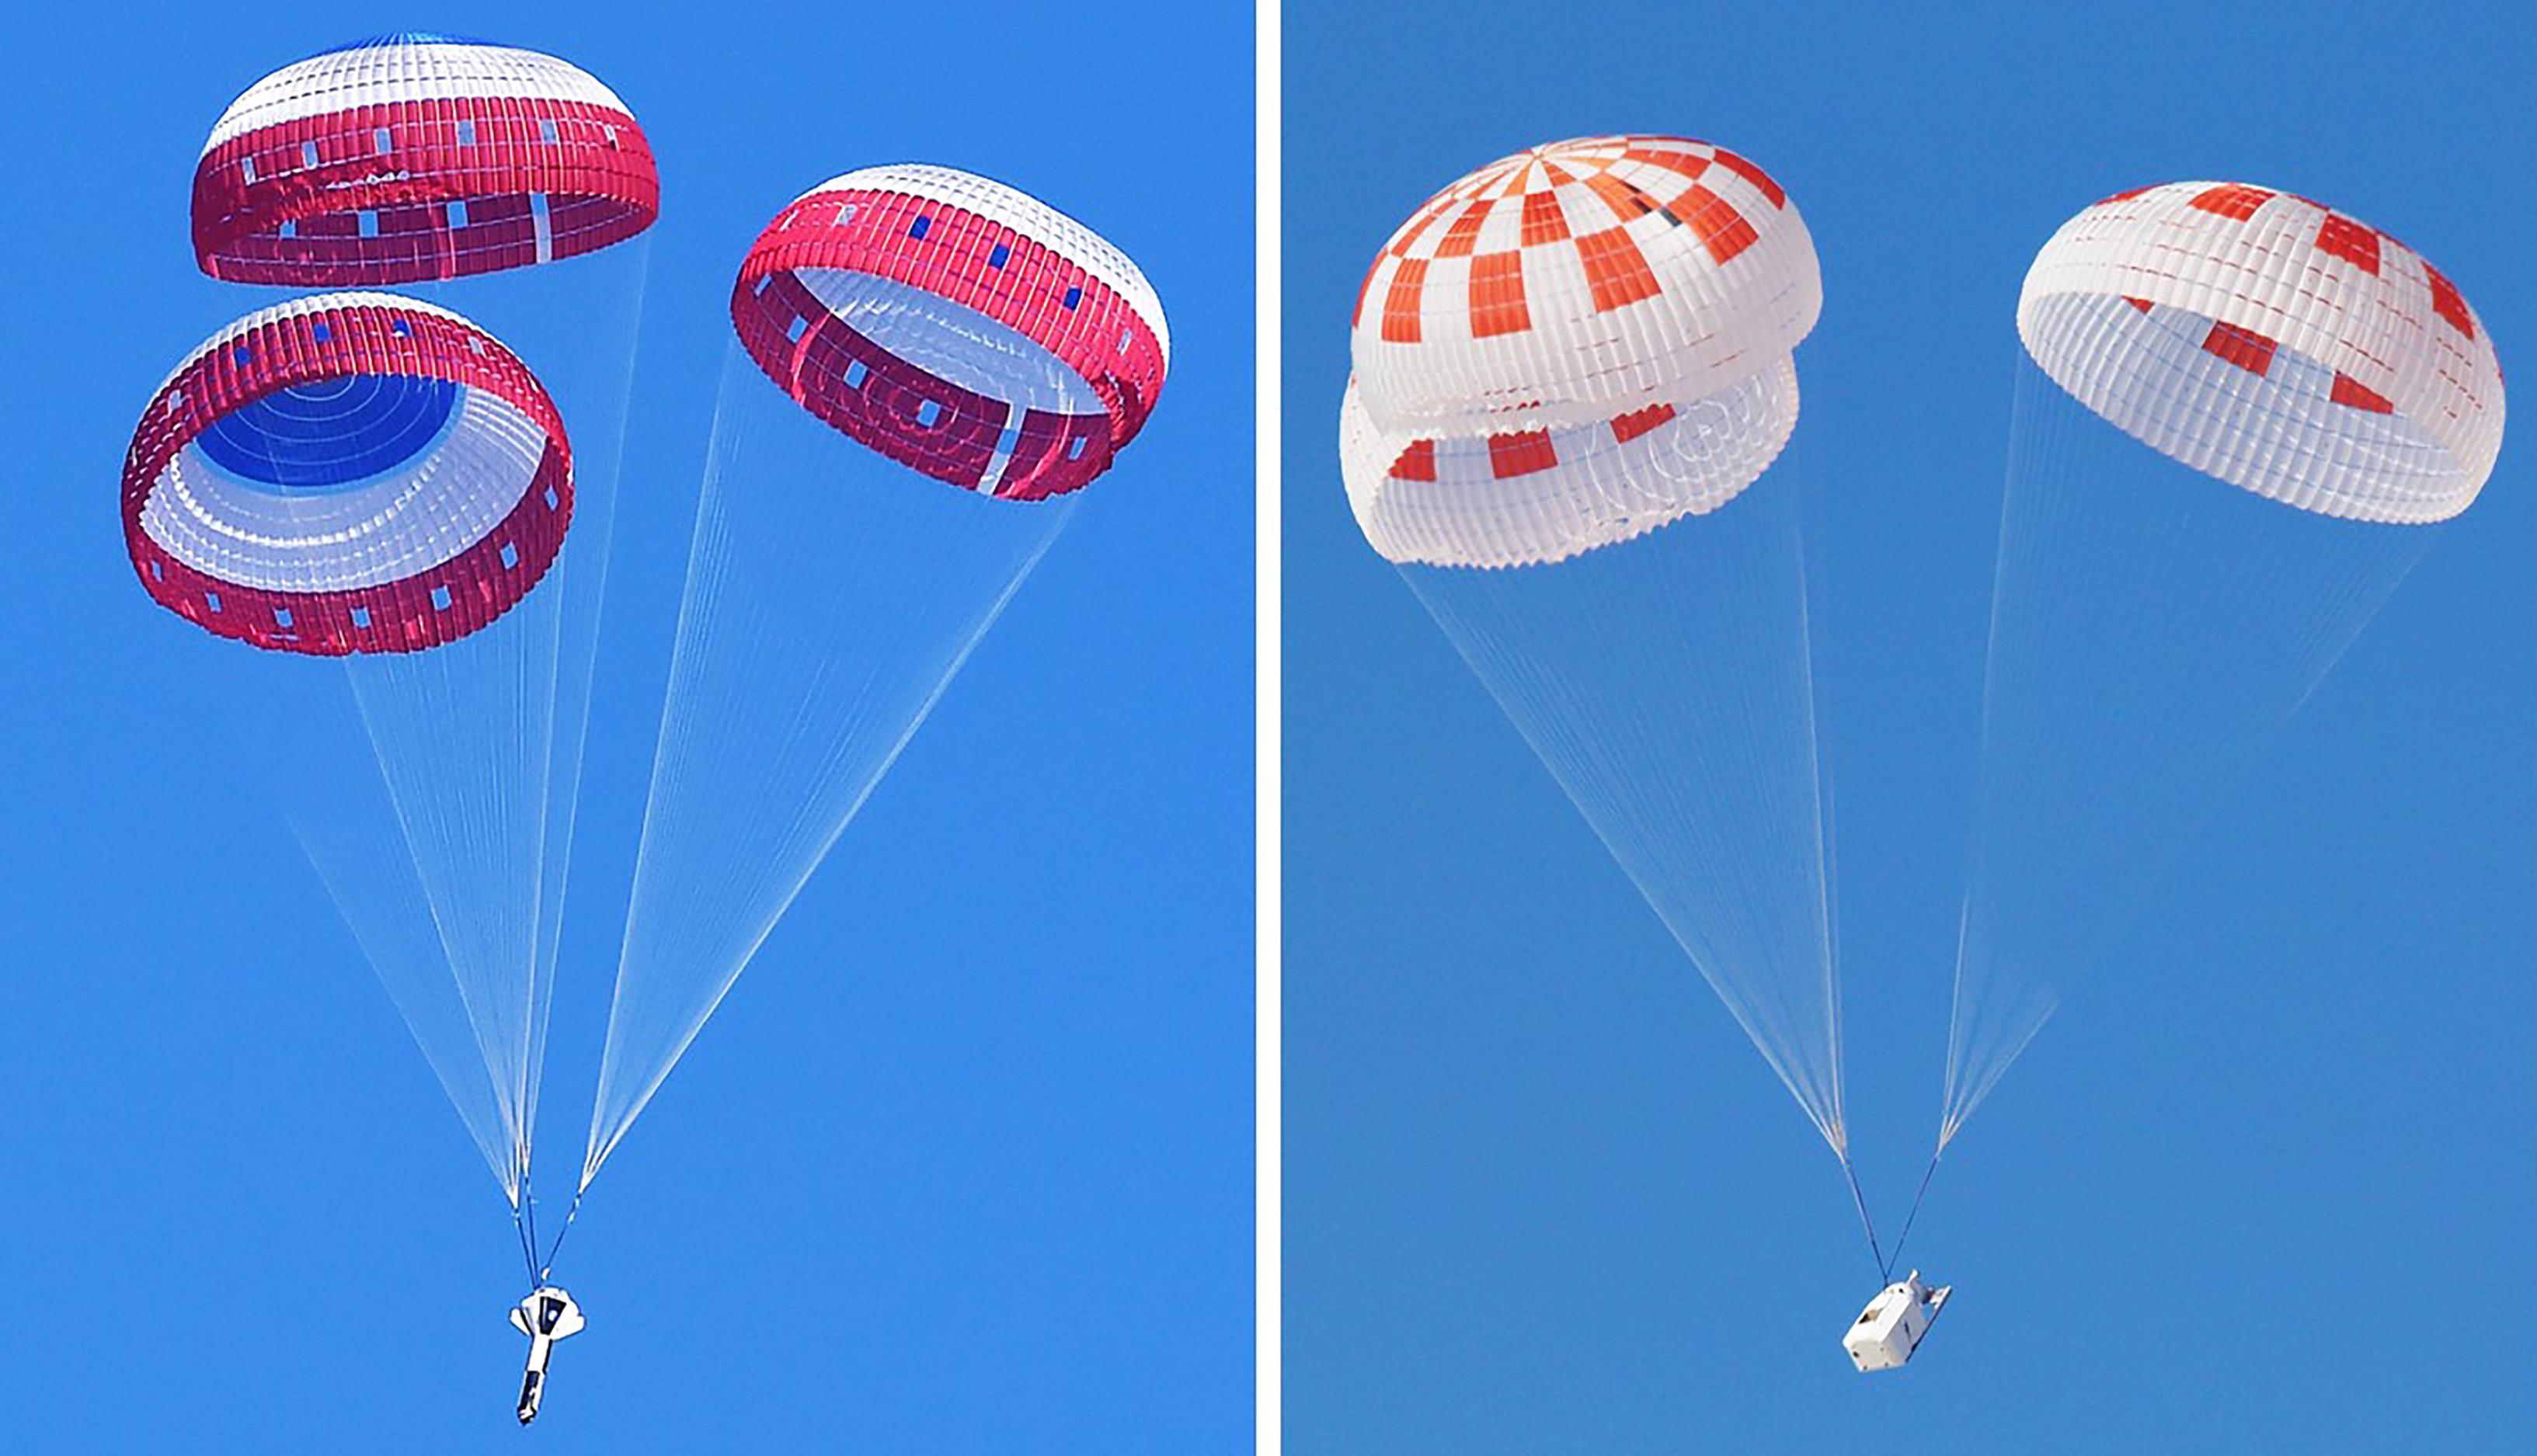 Parachute Testing Lands Partners Closer to Crewed Flight Tests | NASA